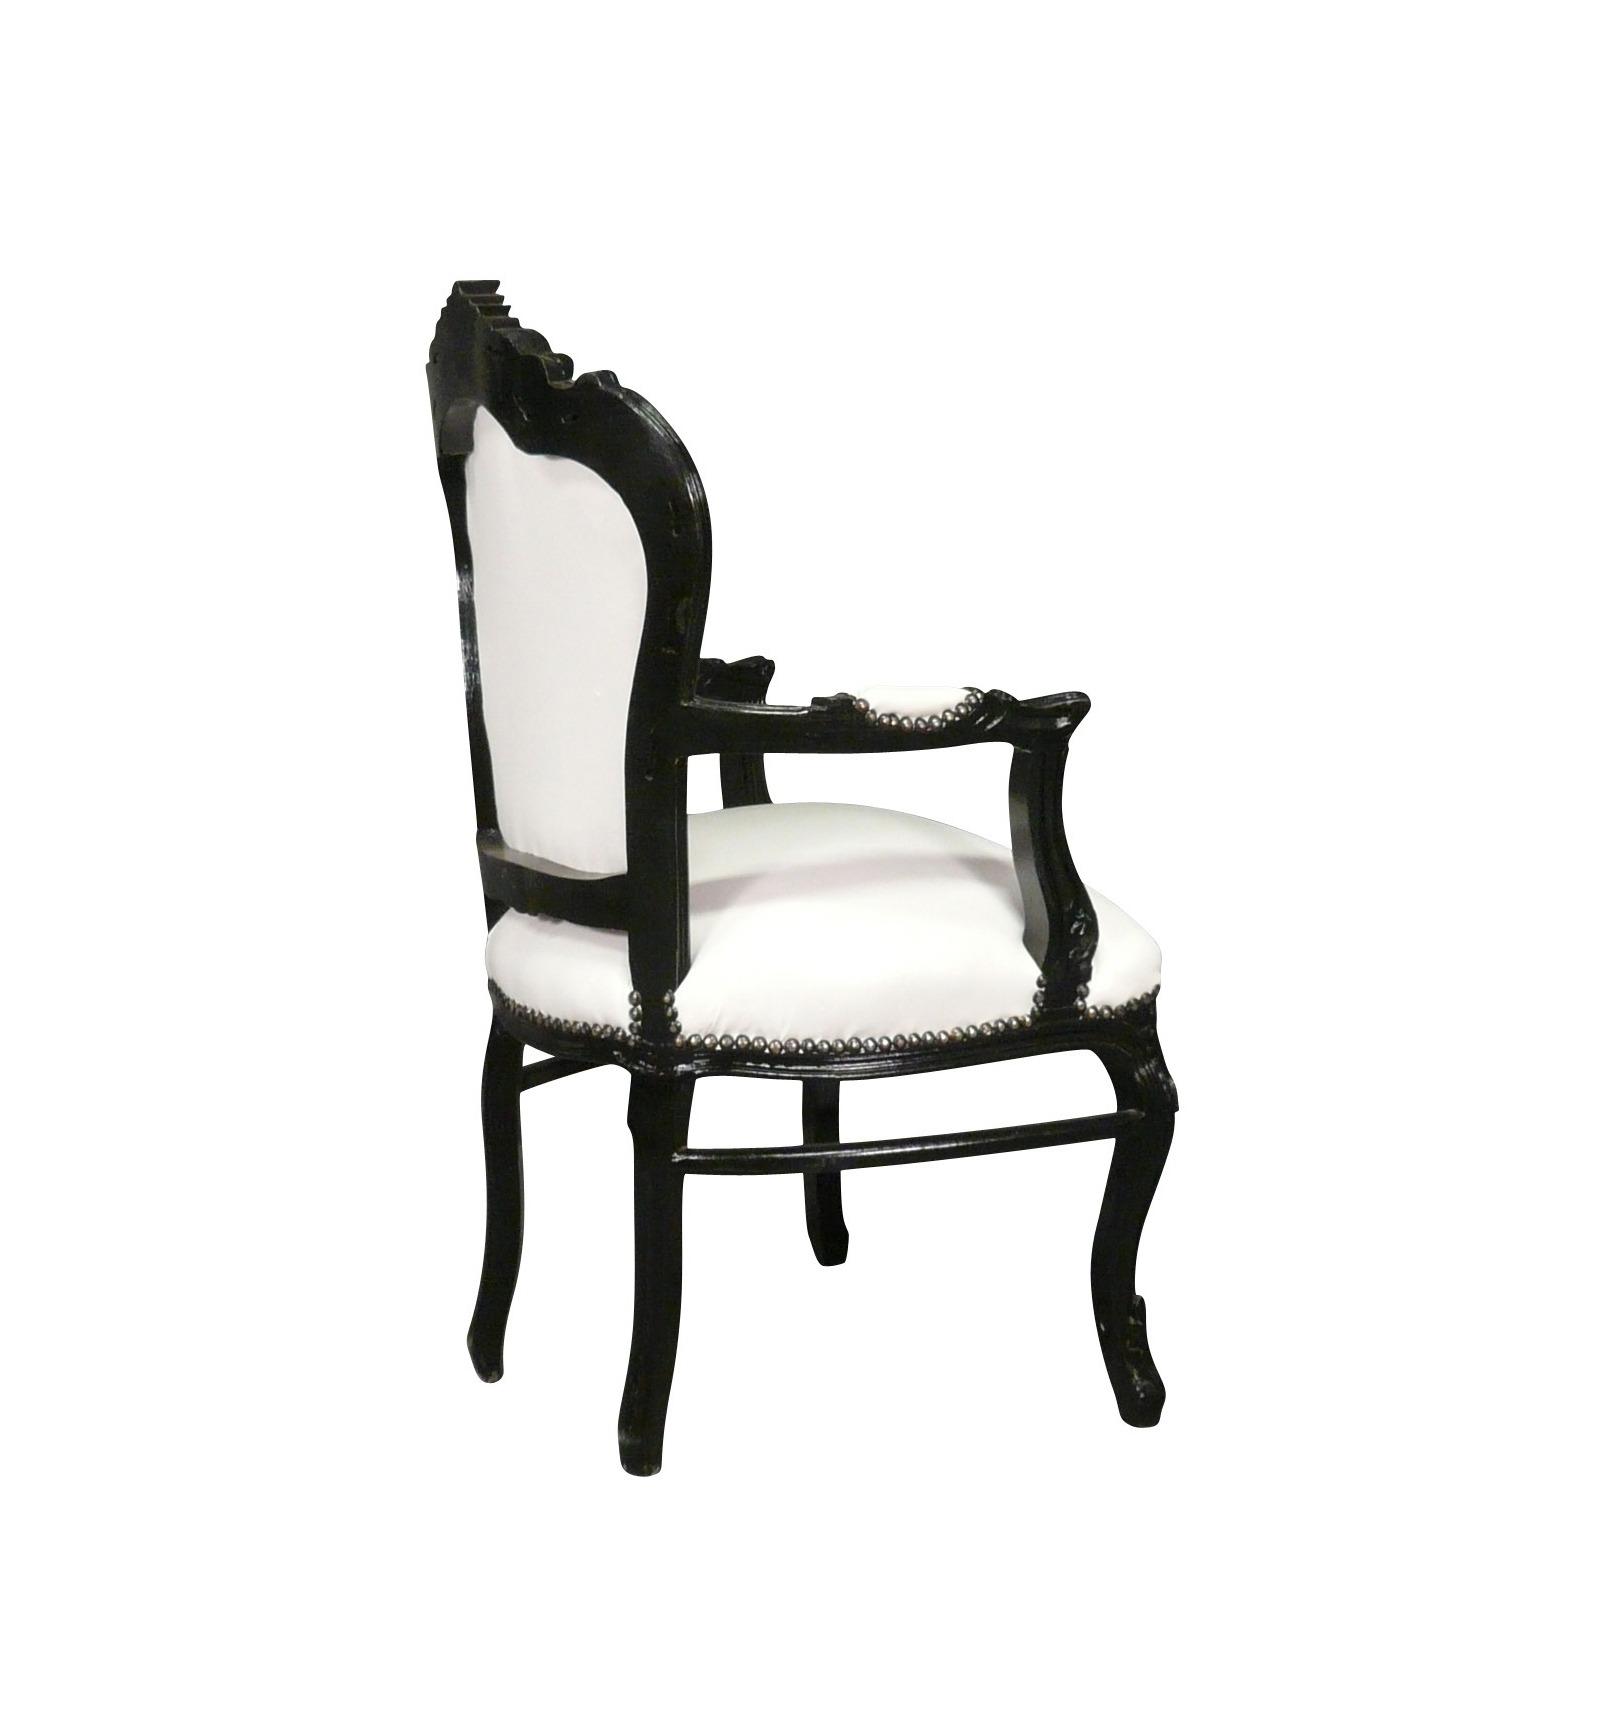 schwarz und wei barock sessel vesoul art deco m bel. Black Bedroom Furniture Sets. Home Design Ideas